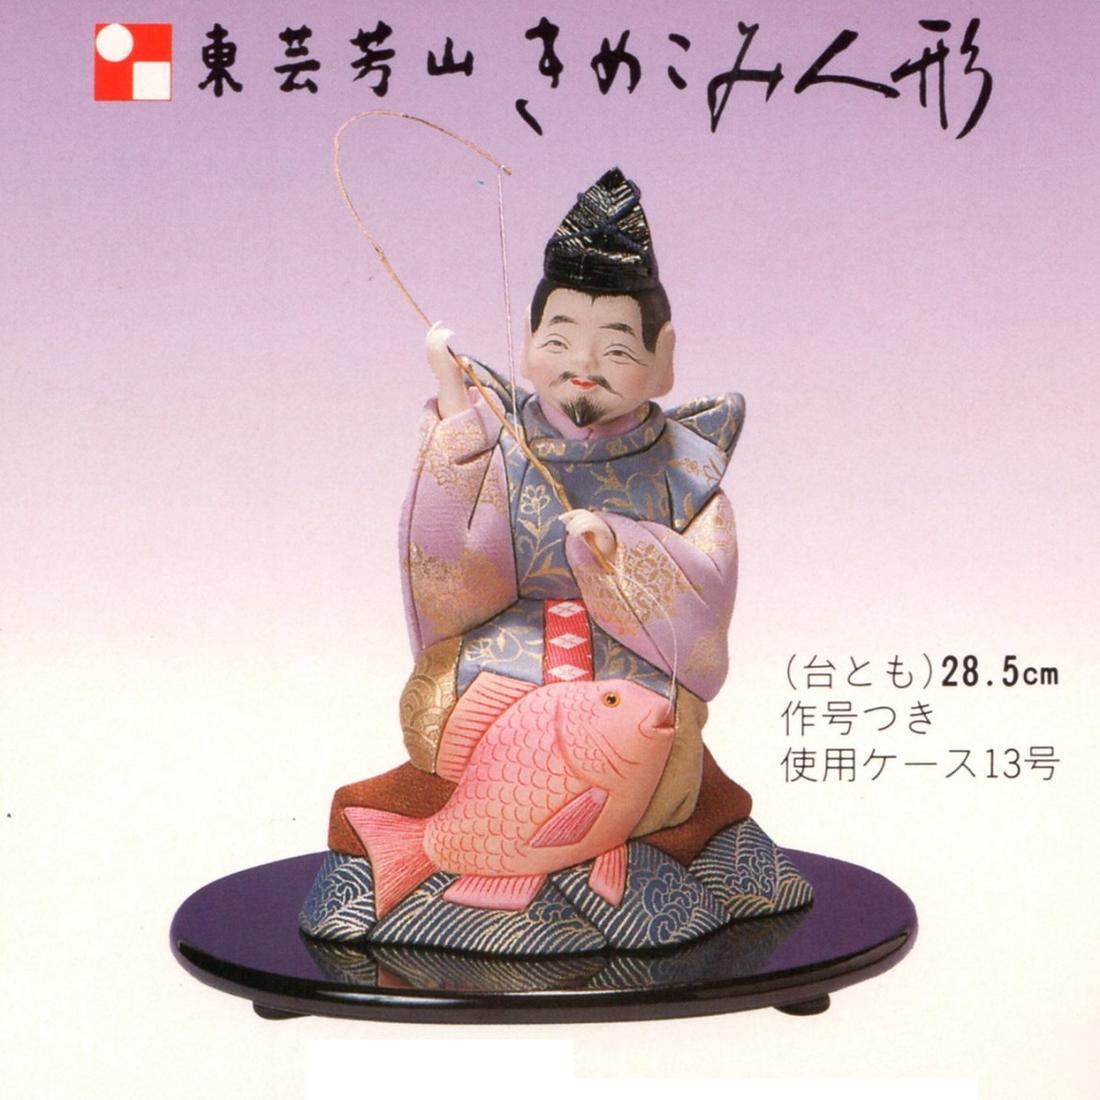 東芸 木目込人形キット「開運七福神・恵比寿」 K706-13